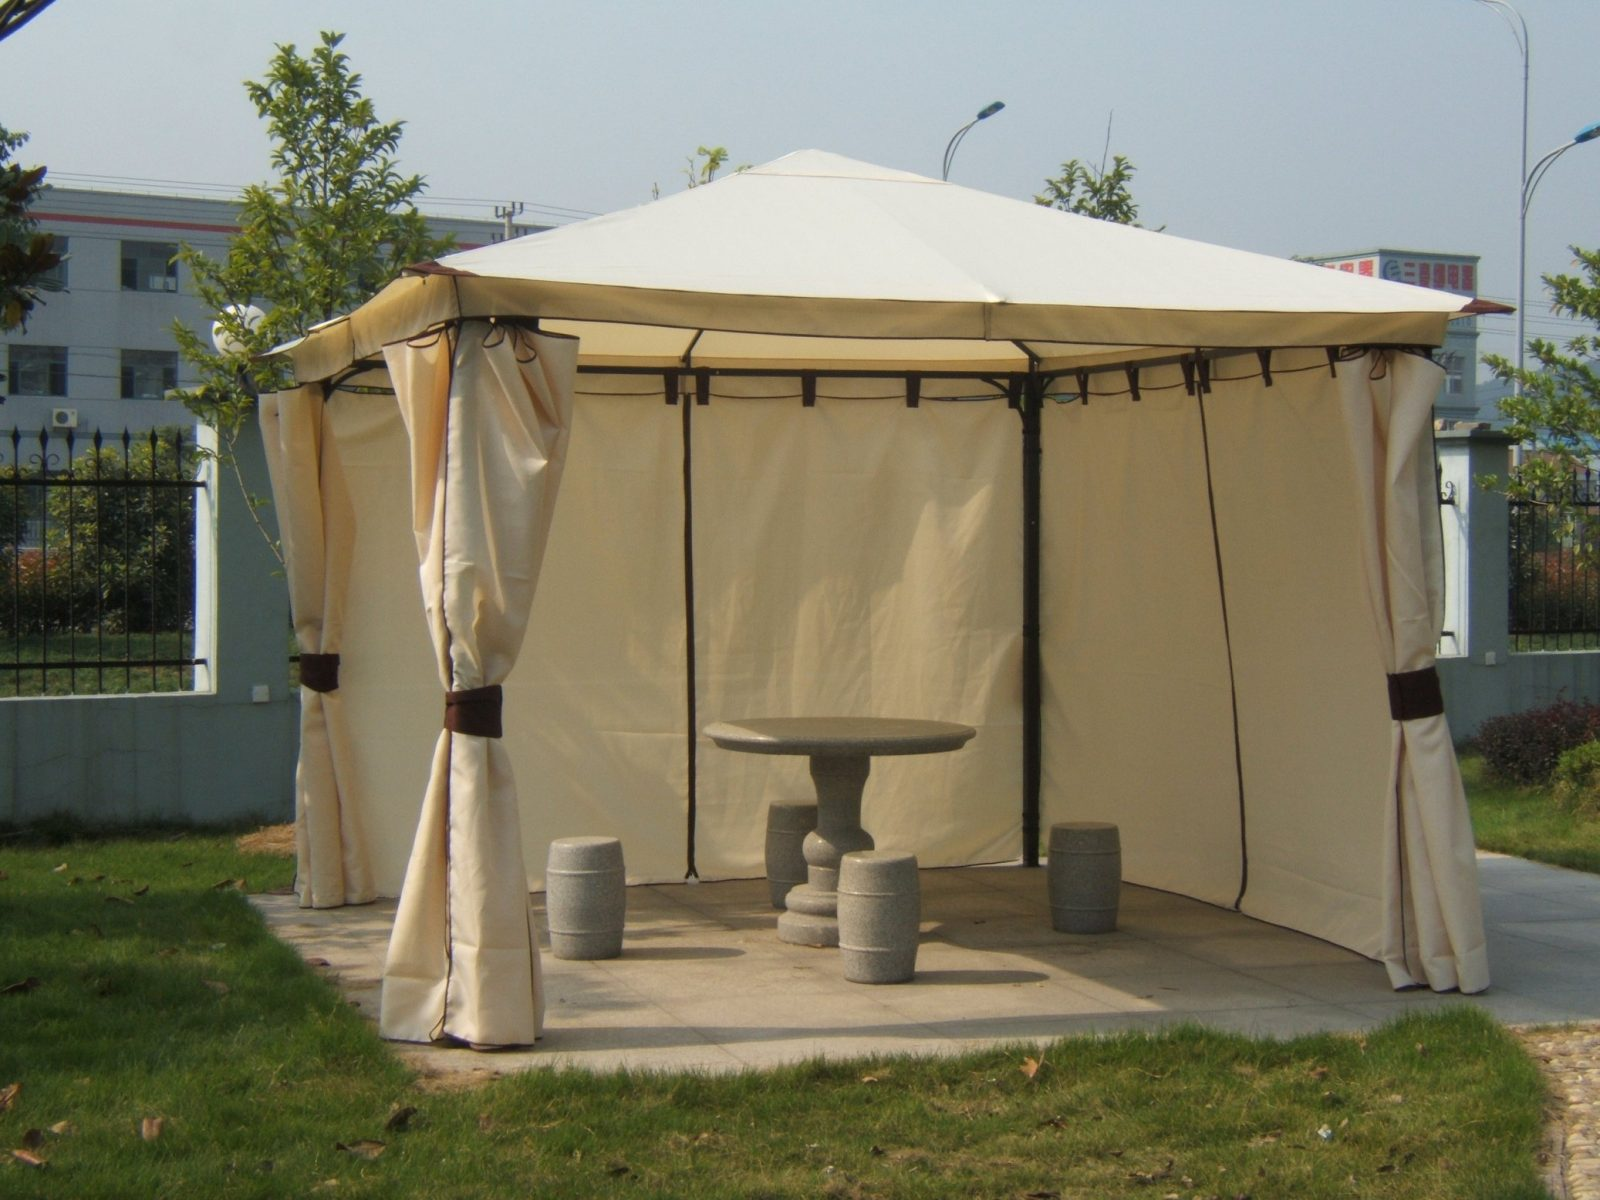 Wasserdicht Pavillon Toskana 3X3M Wasserfest Pvc Metall Ideen von Pavillon Metall 3X3 Wasserdicht Bild